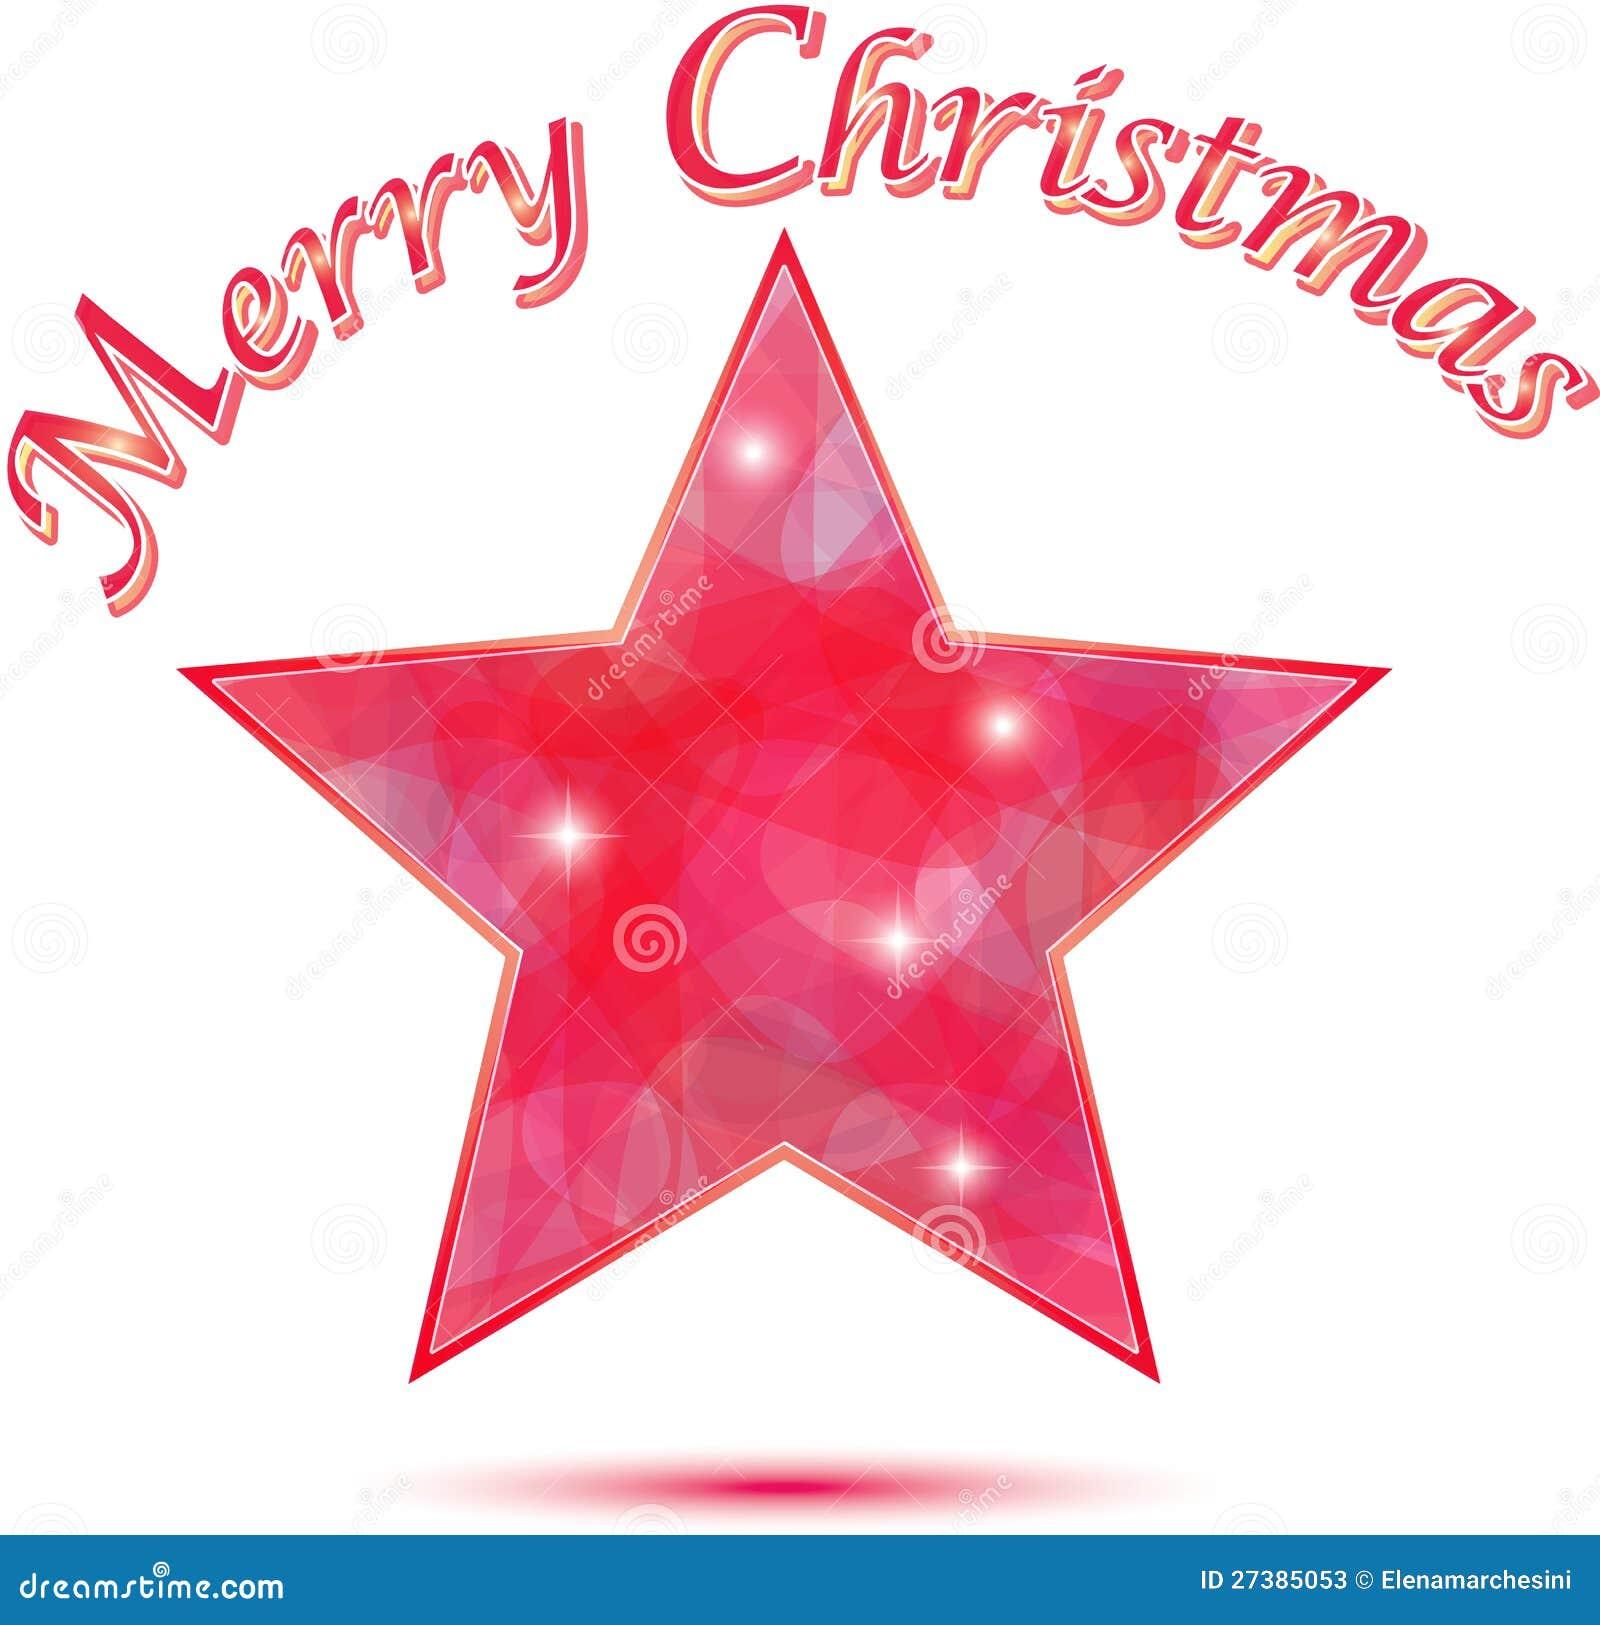 Merry Christmas Star Background Stock Photos - Image: 27385053